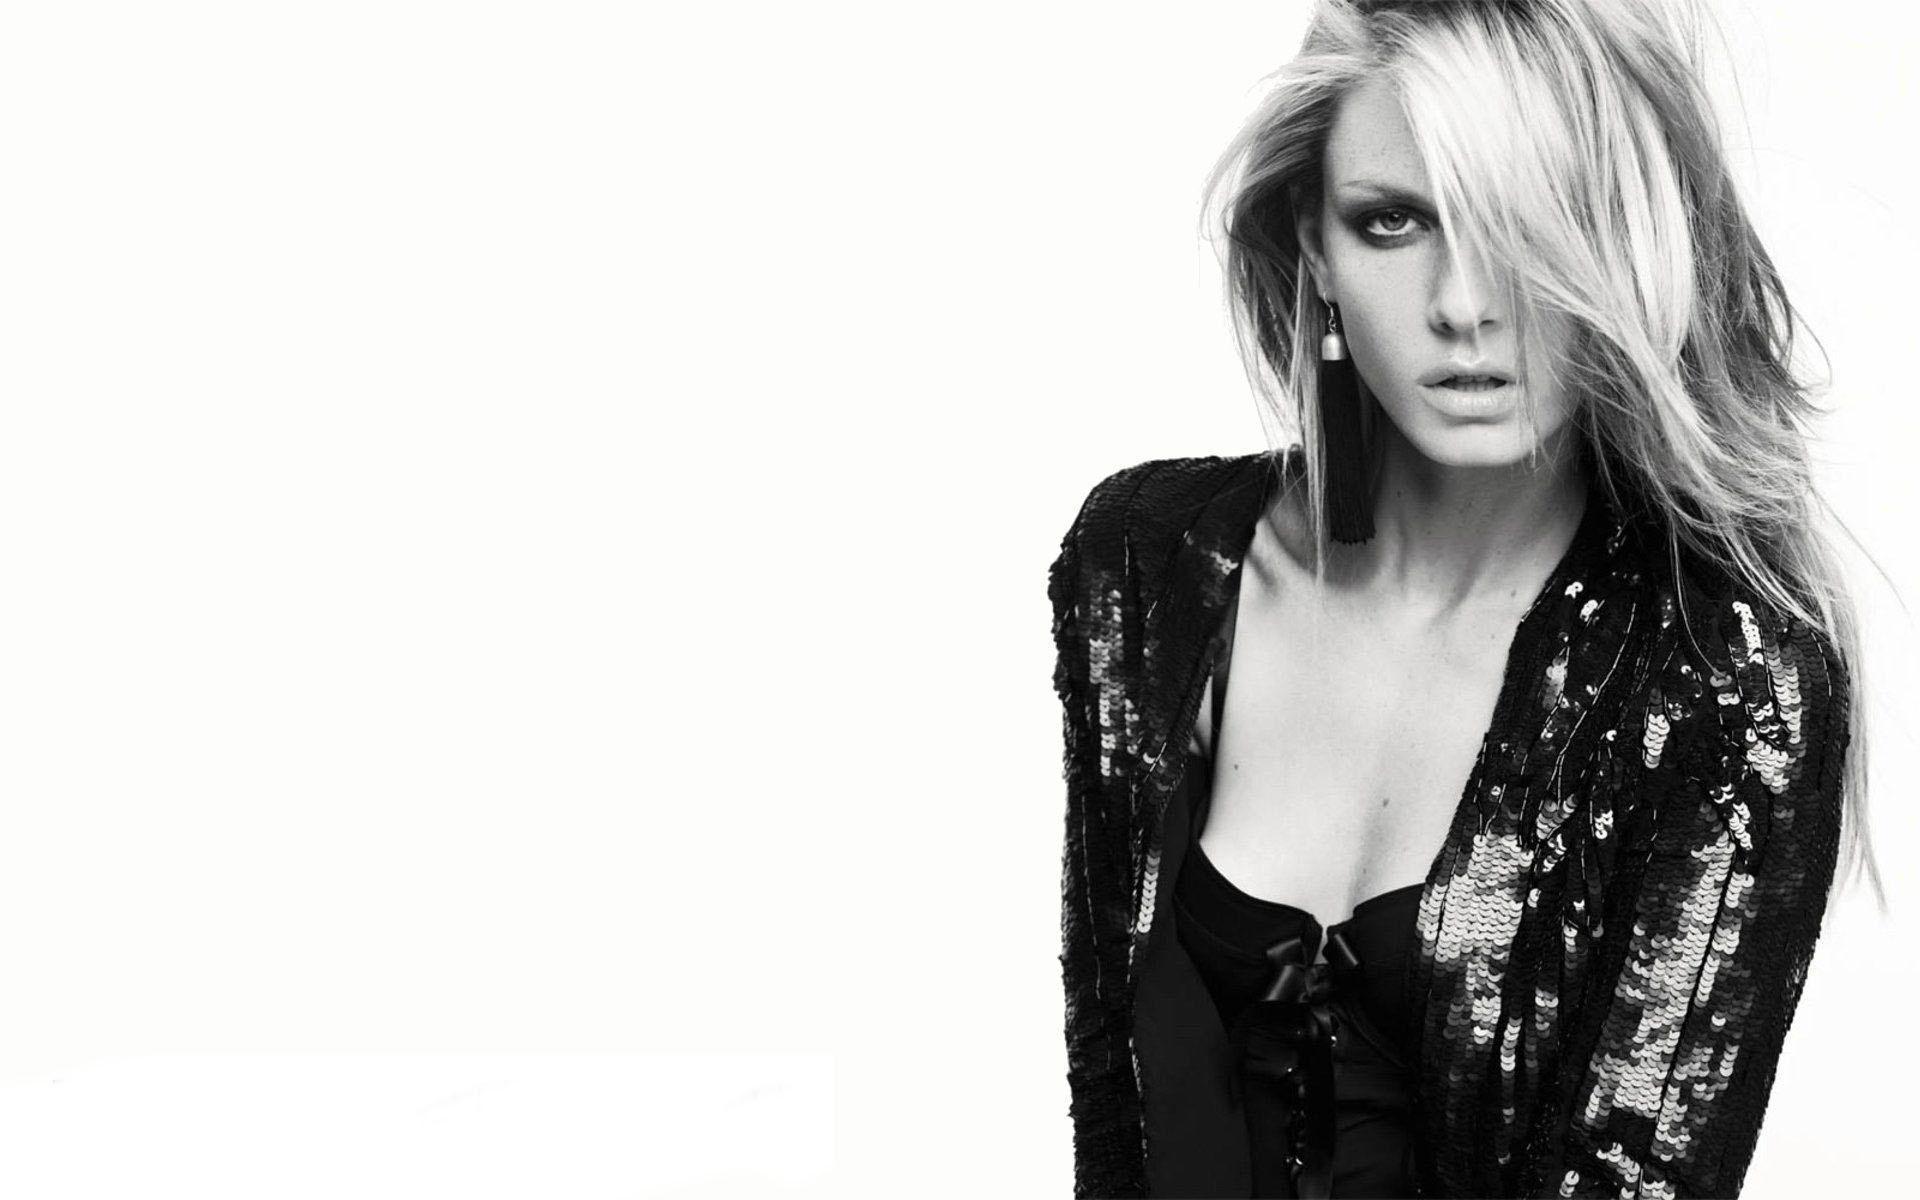 Celebrity Angela Lindvall nude photos 2019